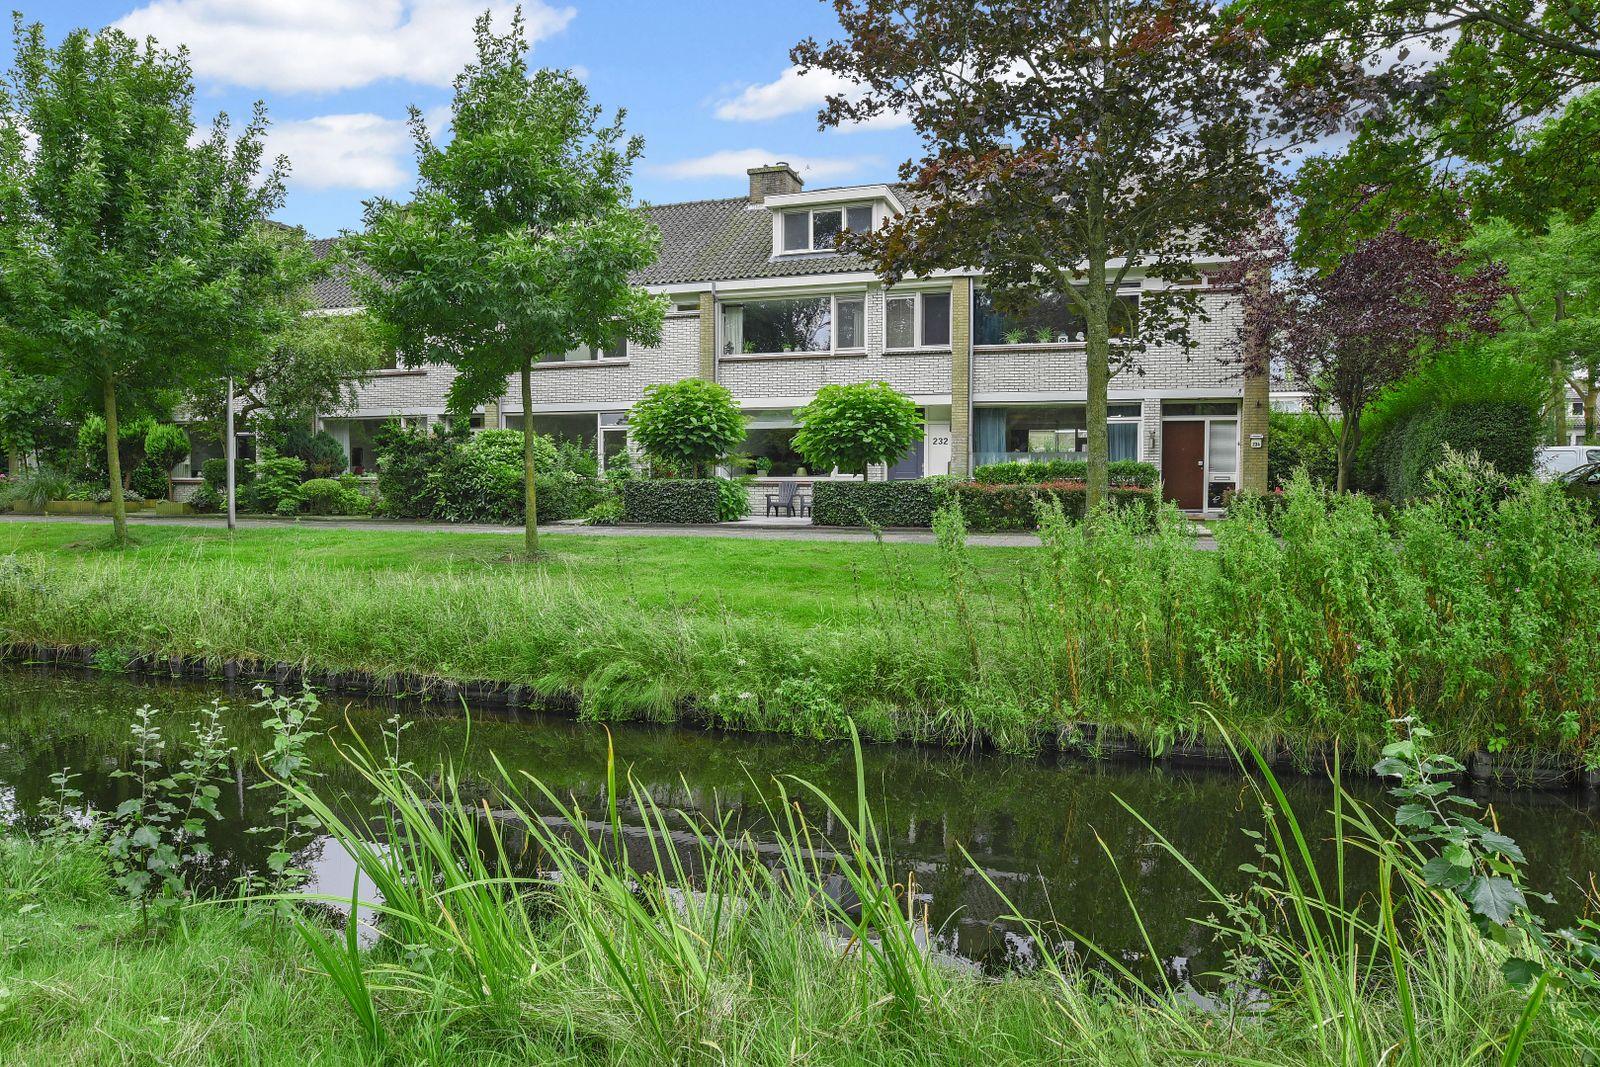 Van Polanenpark 232, Wassenaar